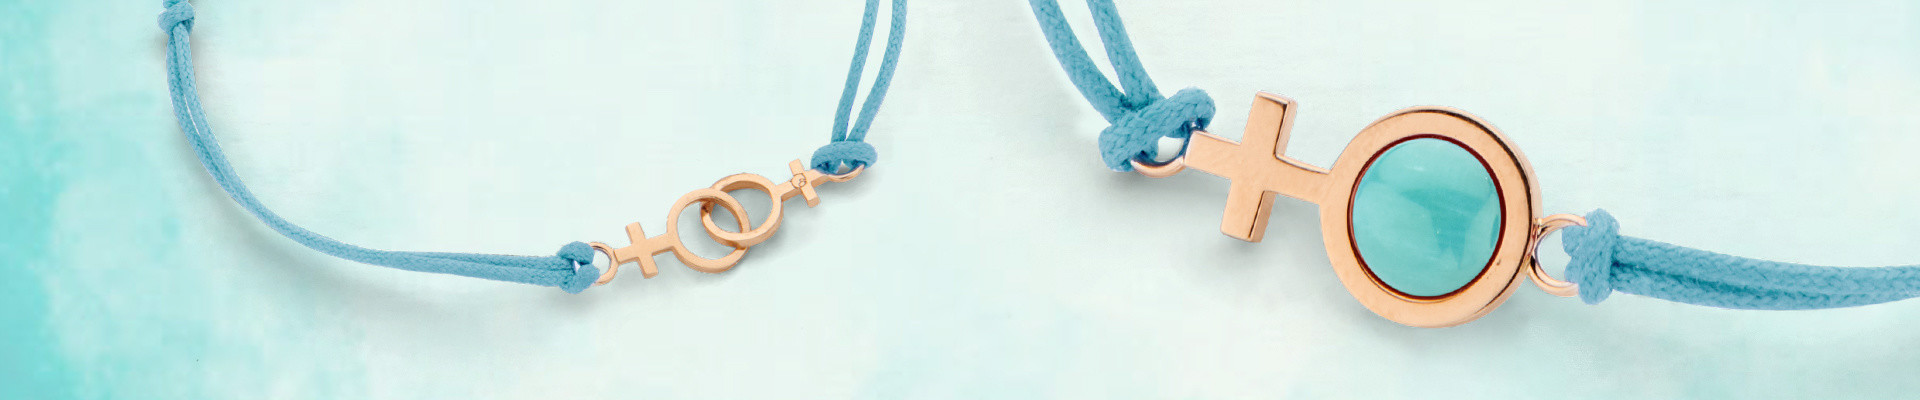 Gift for Life armbanden Leon Martens Juwelier